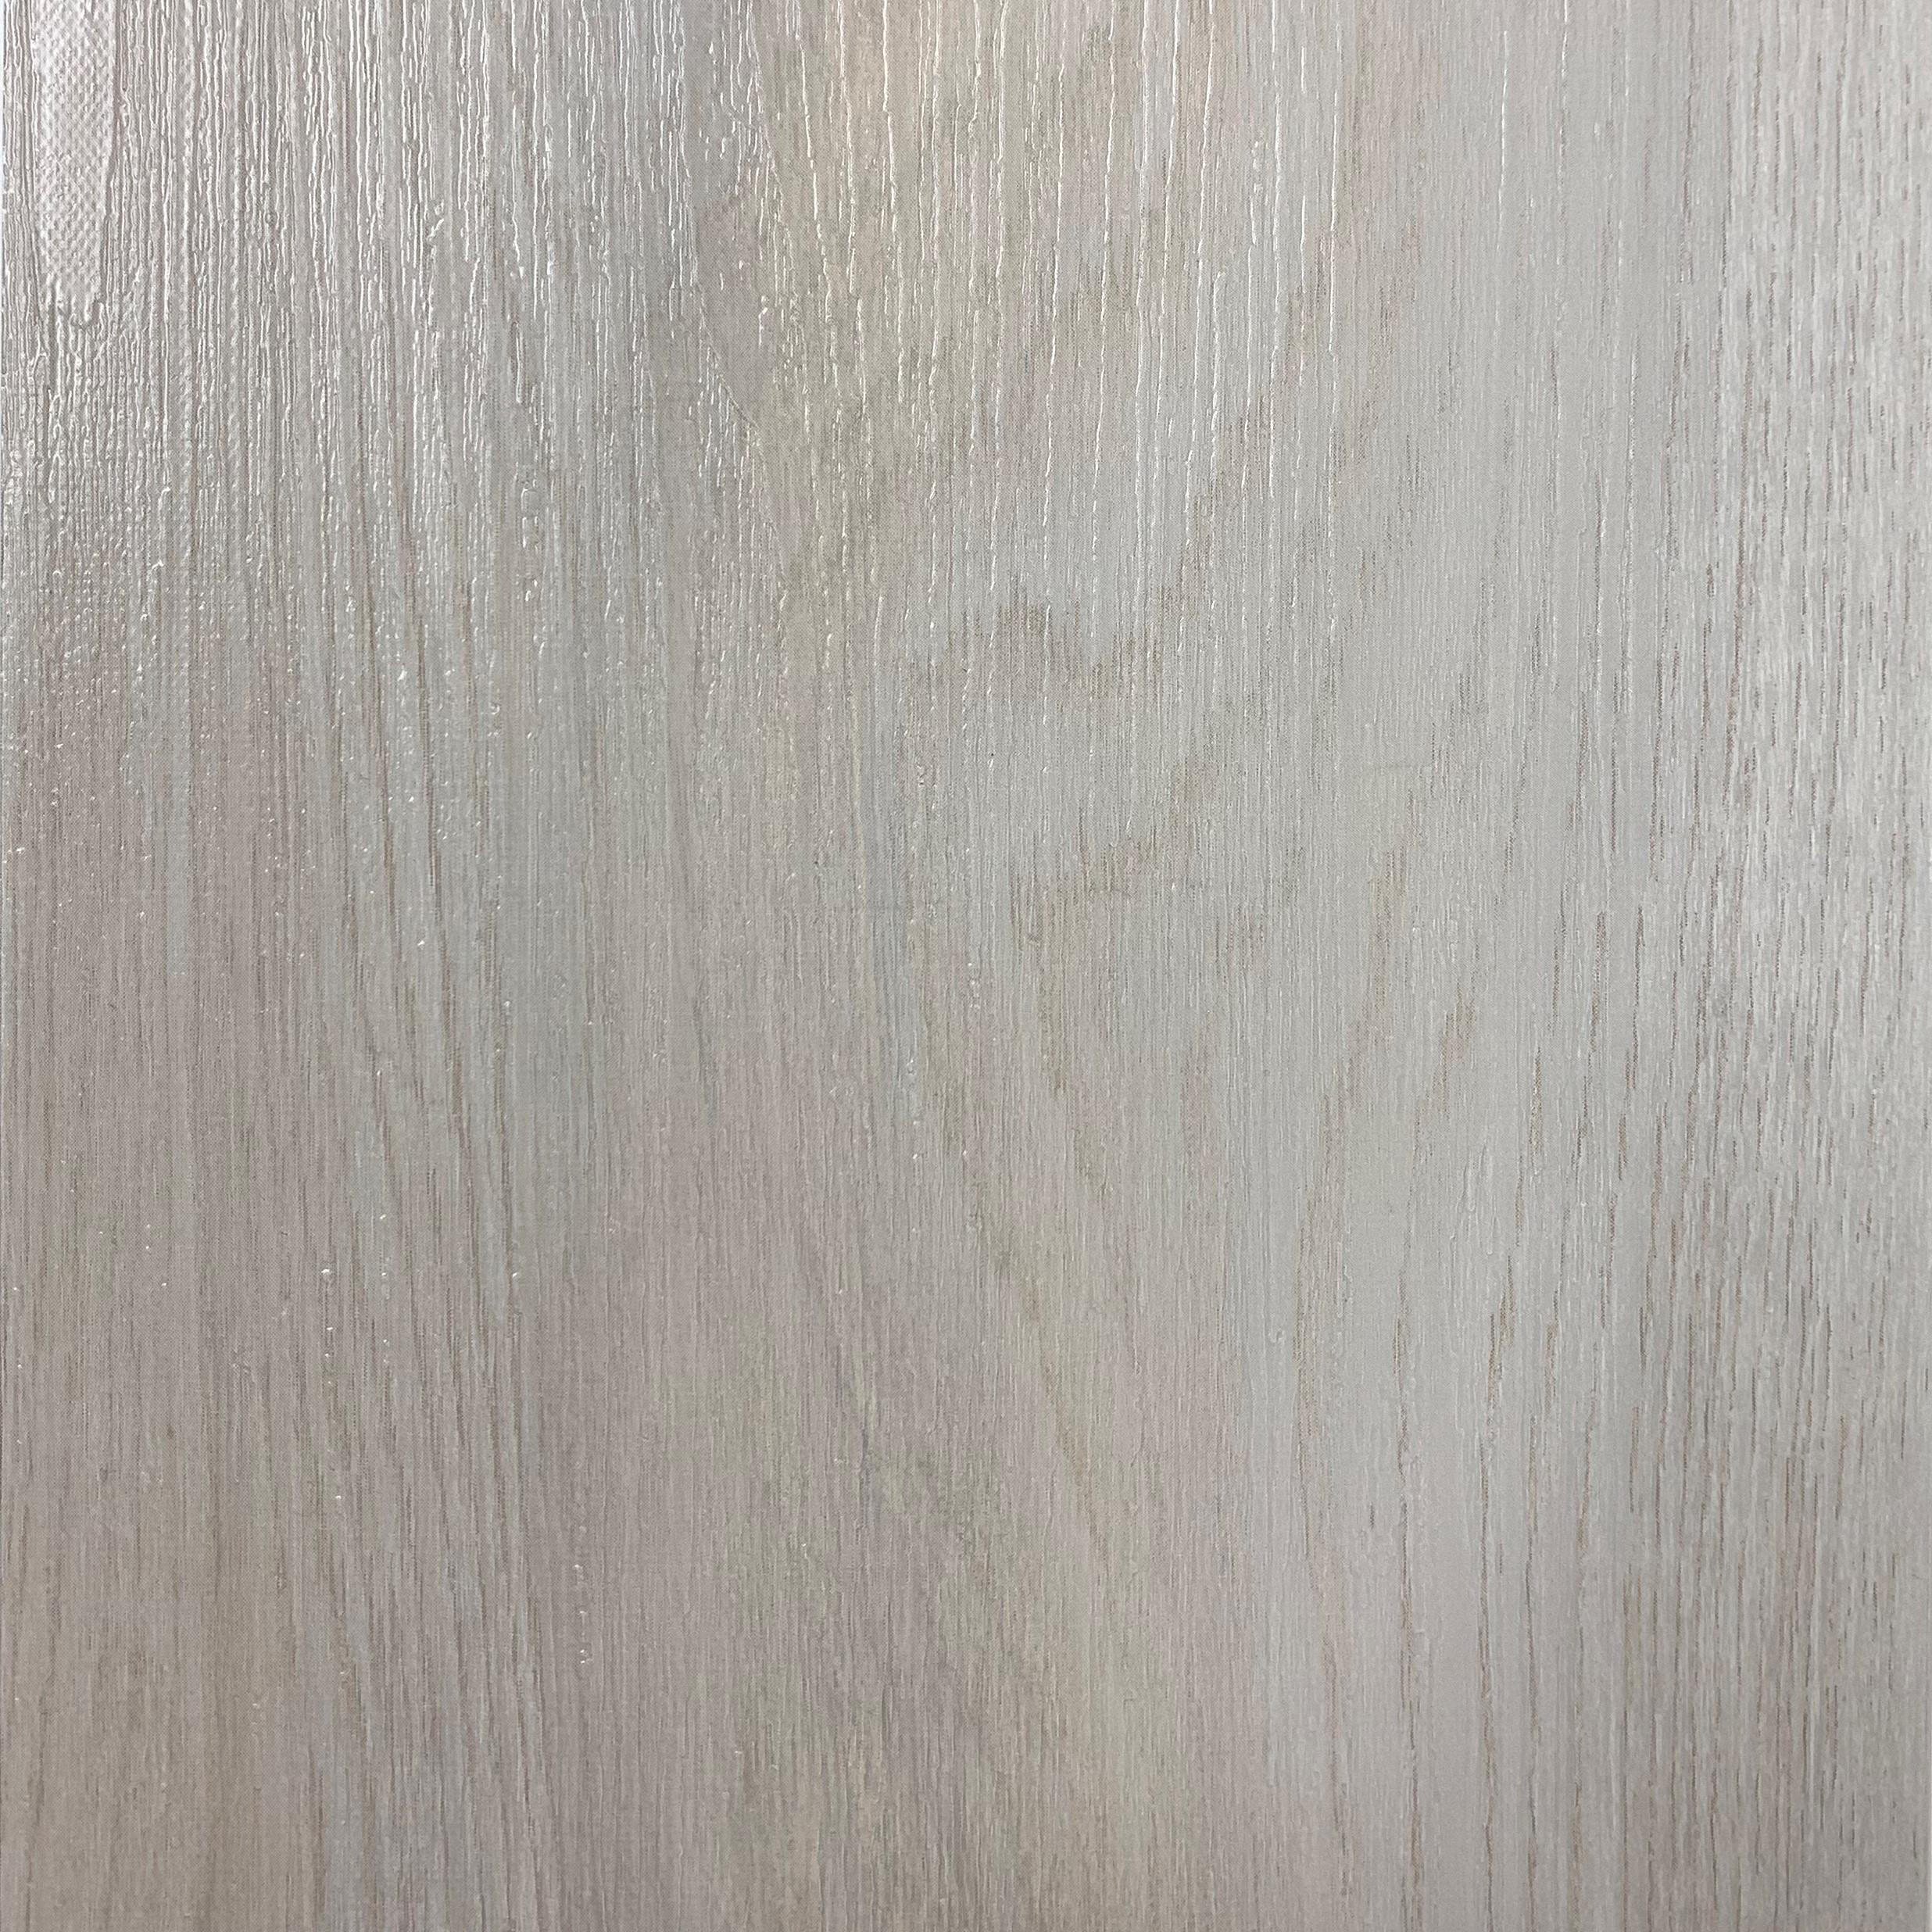 Fatraclick Dub Sněžný 15661-3